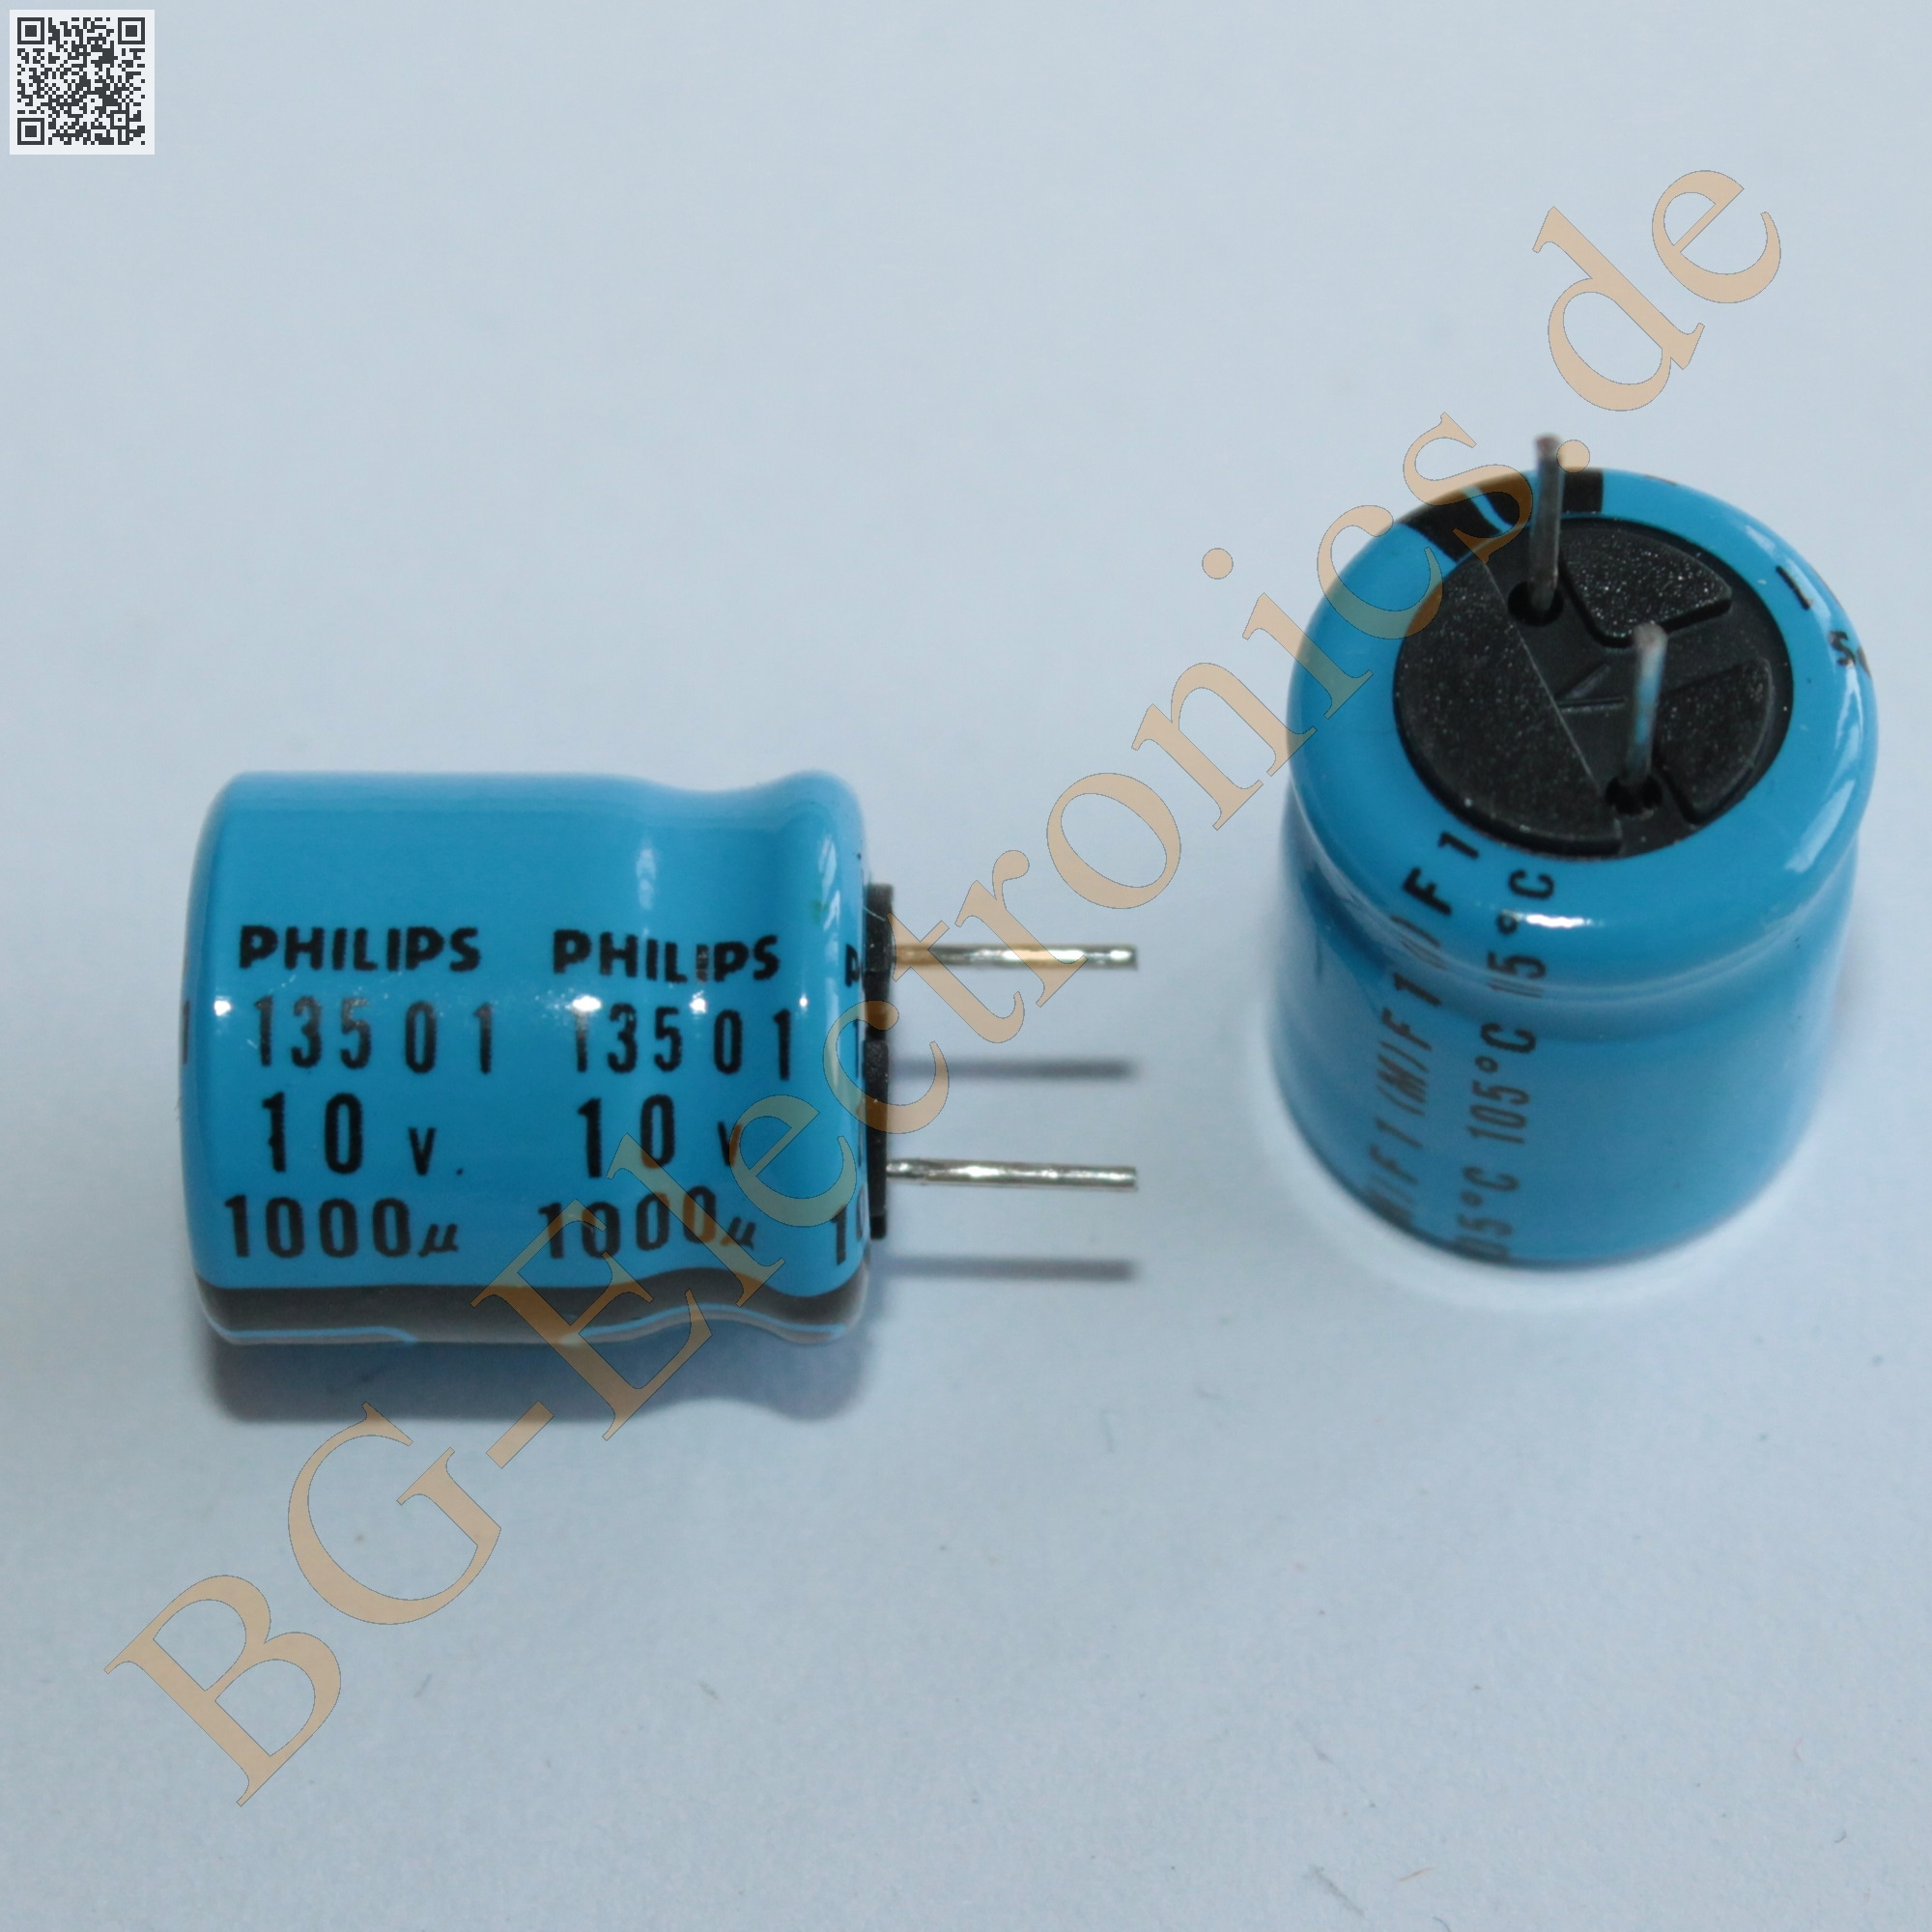 10 x 1000 f 1000uf 10v 105 rm5 elko kondensator capacitor rad philips 10pcs ebay. Black Bedroom Furniture Sets. Home Design Ideas